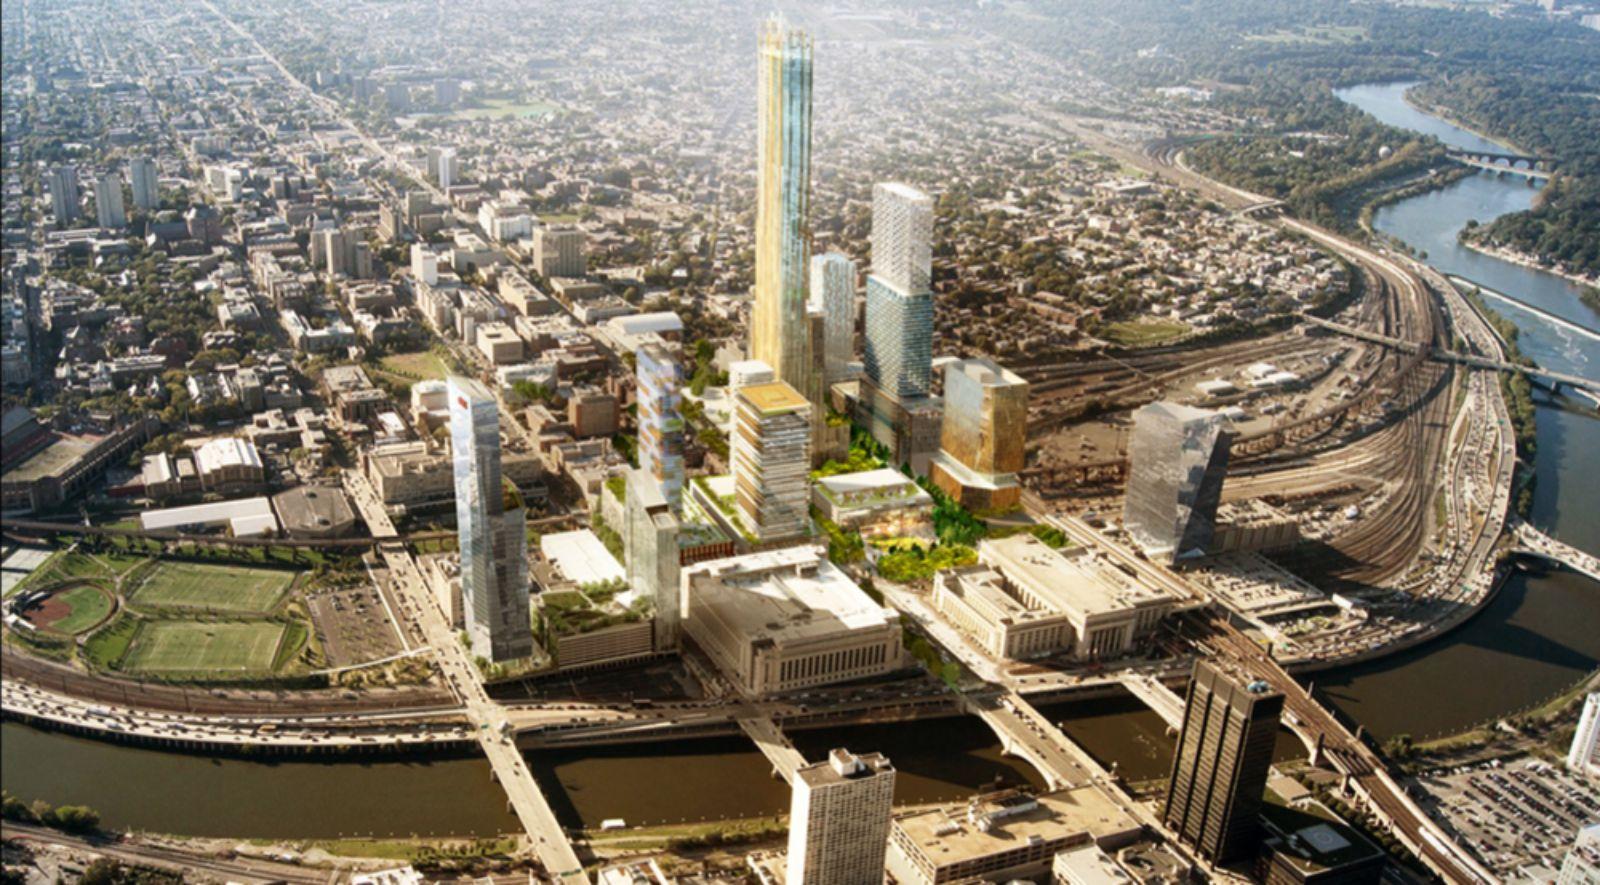 master plan for Philadelphia's Schuylkill Yards